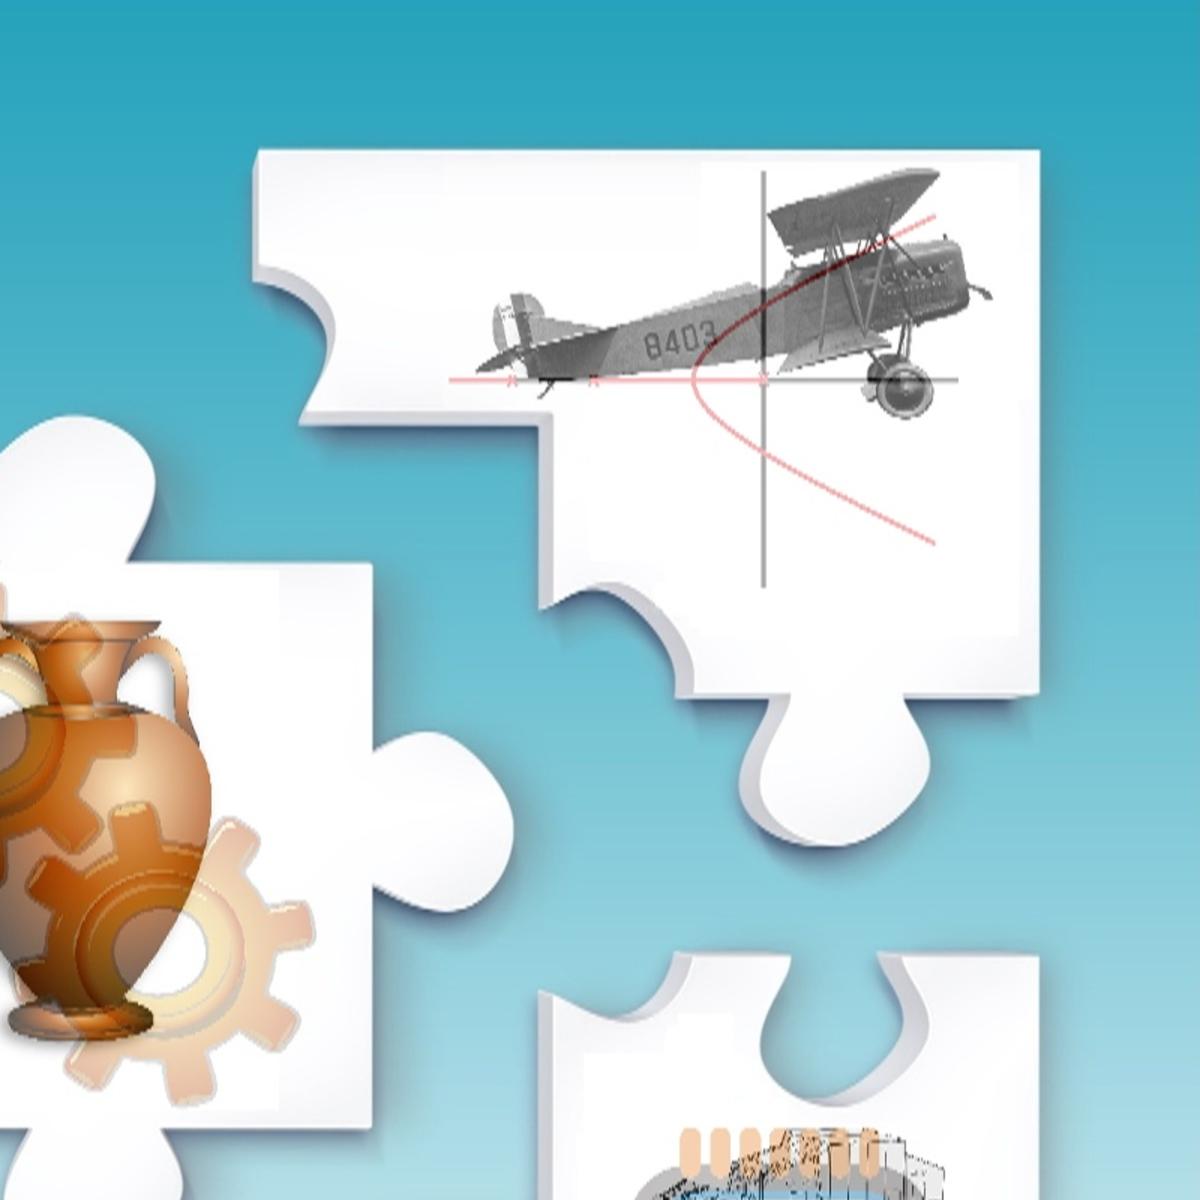 Controle de Sistemas no Plano-s course image